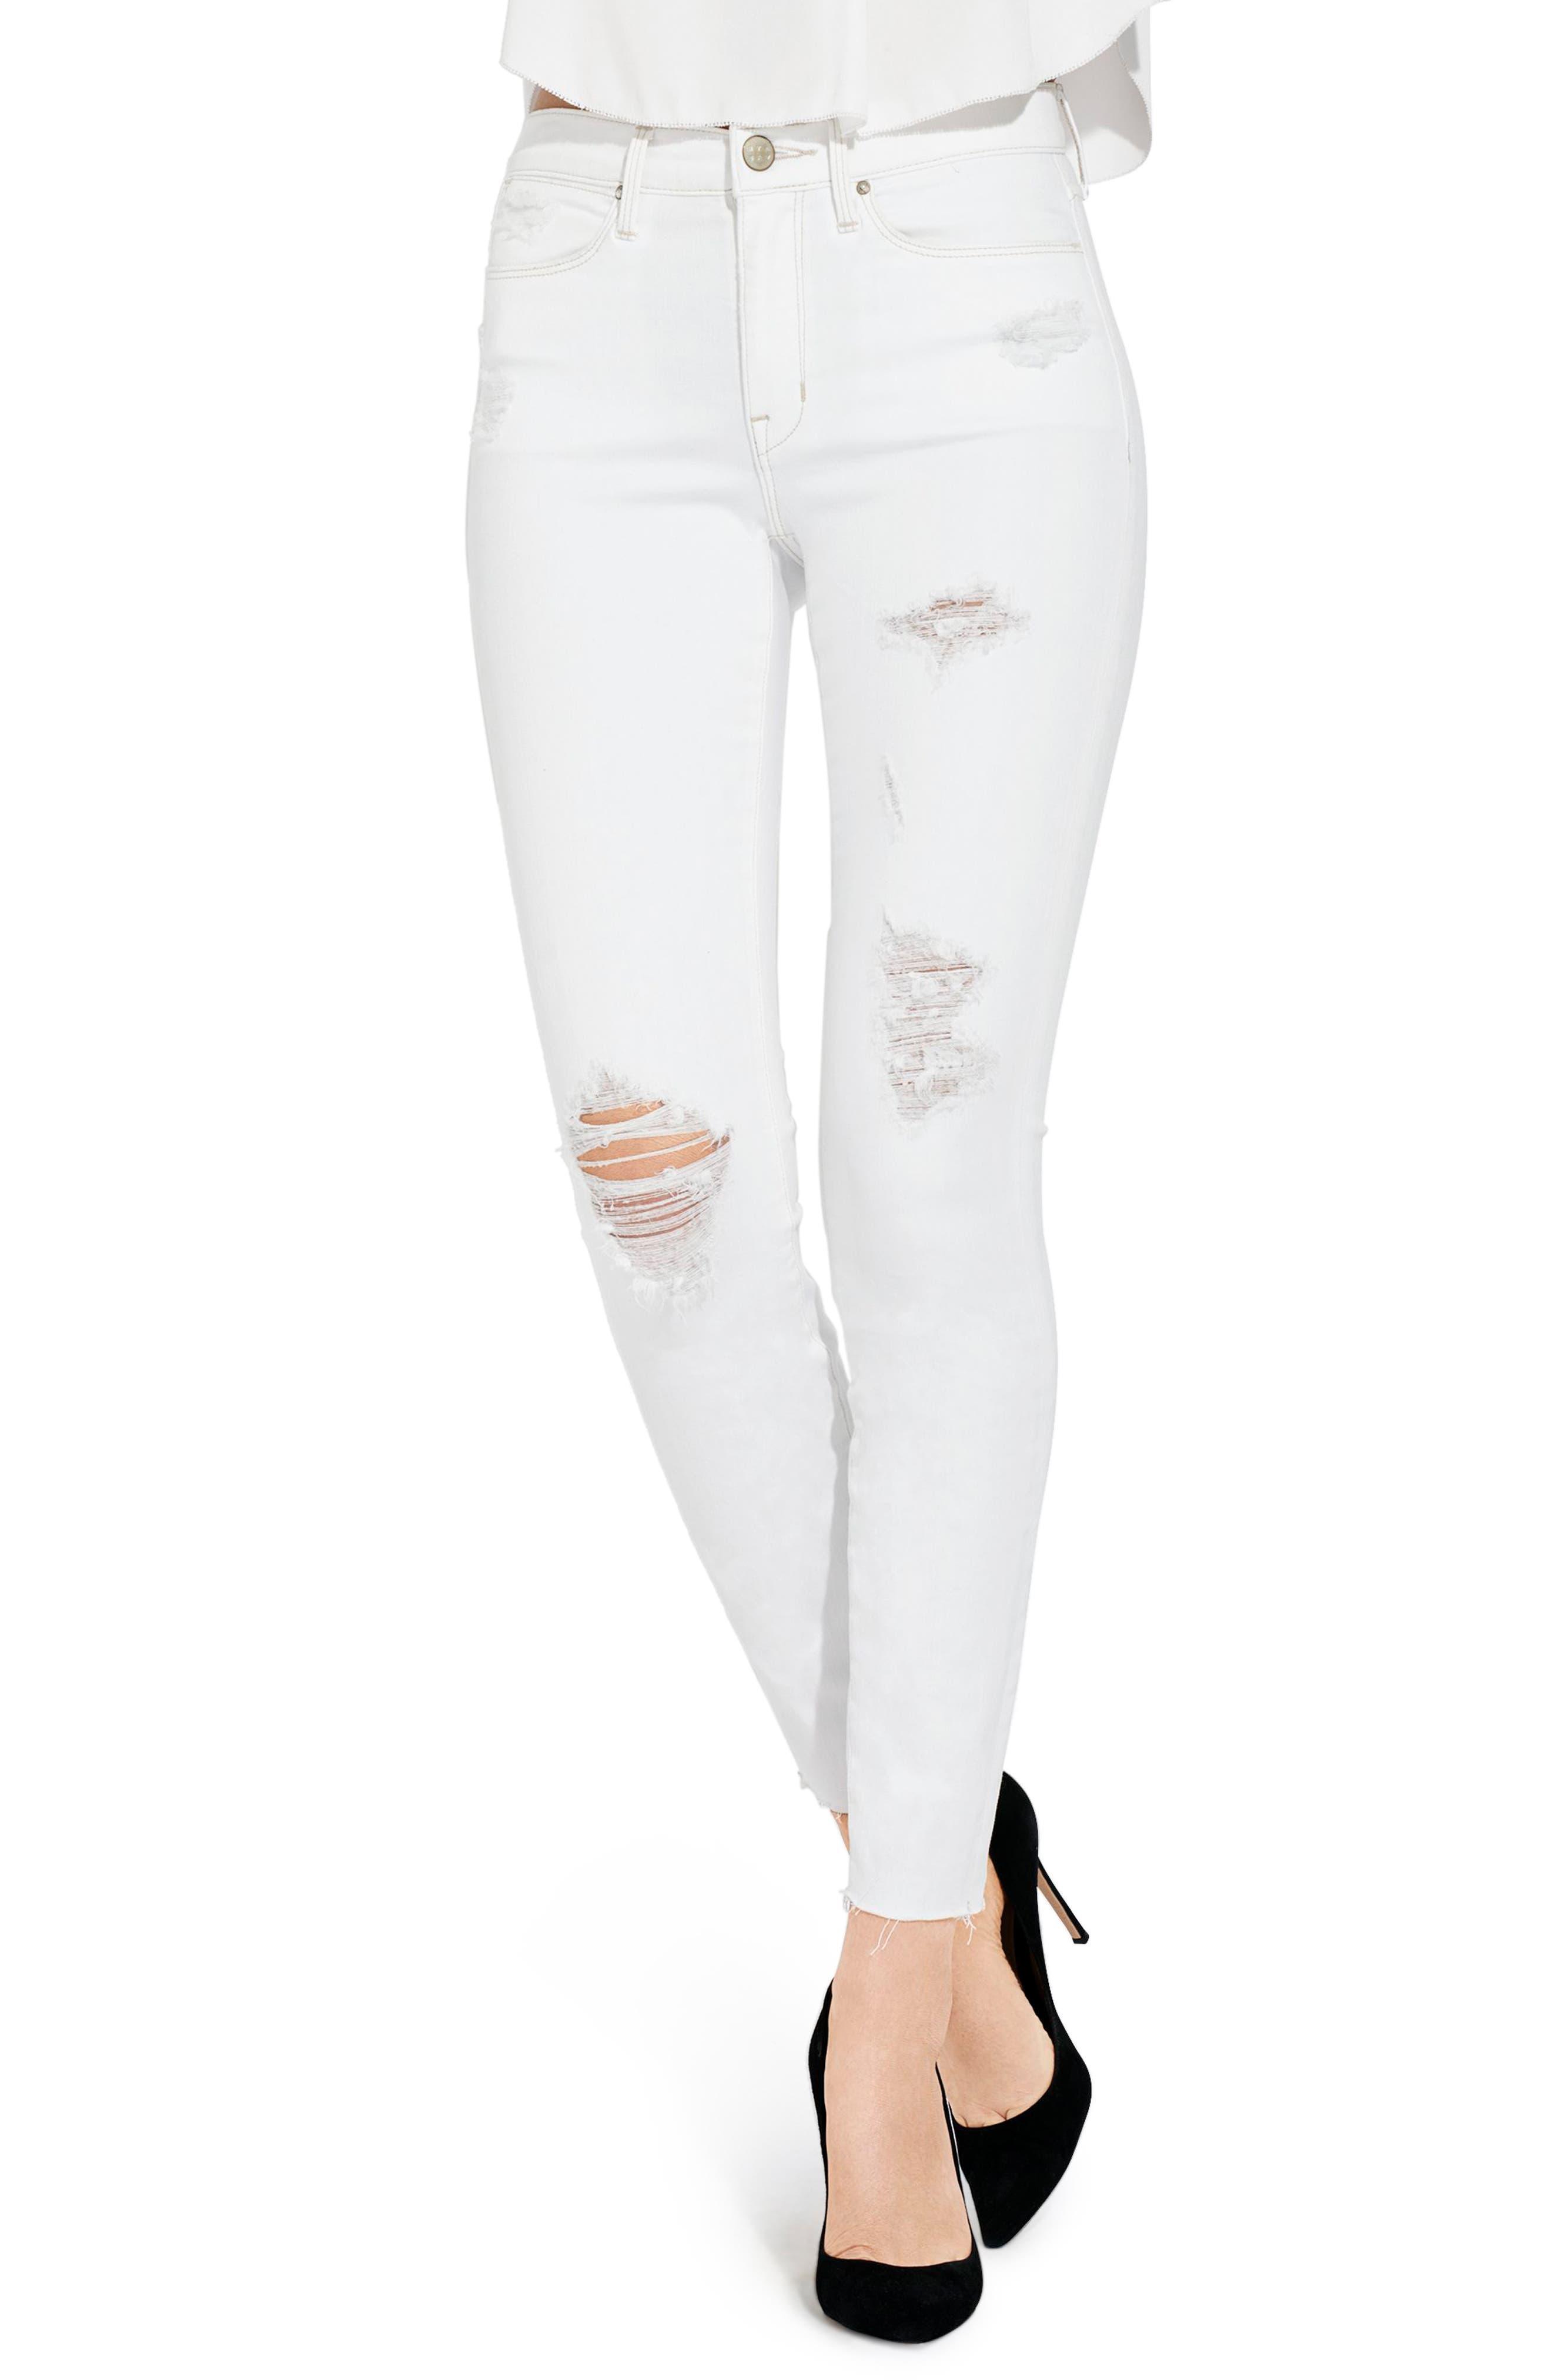 AYR The Skinny Jeans (Bunny)